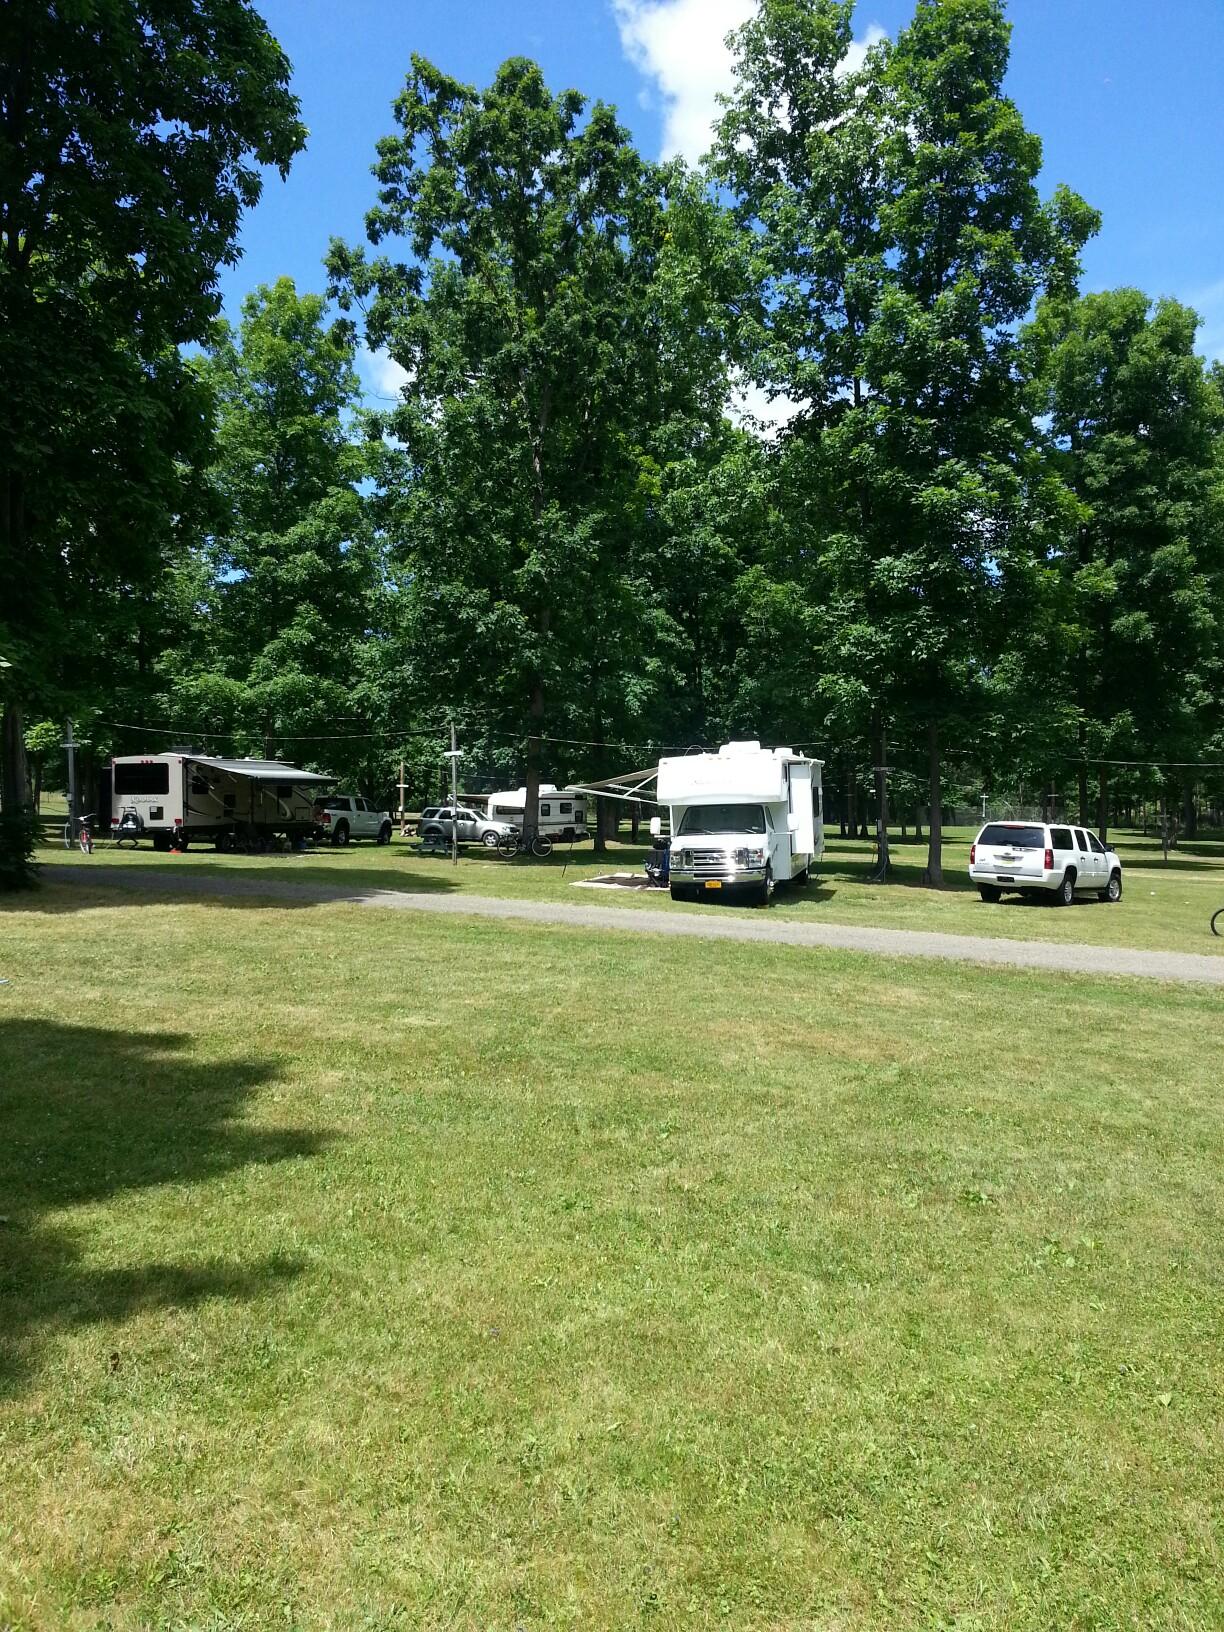 http://wnyrvrental.com/wp-content/uploads/2016/07/Camping-1.jpeg